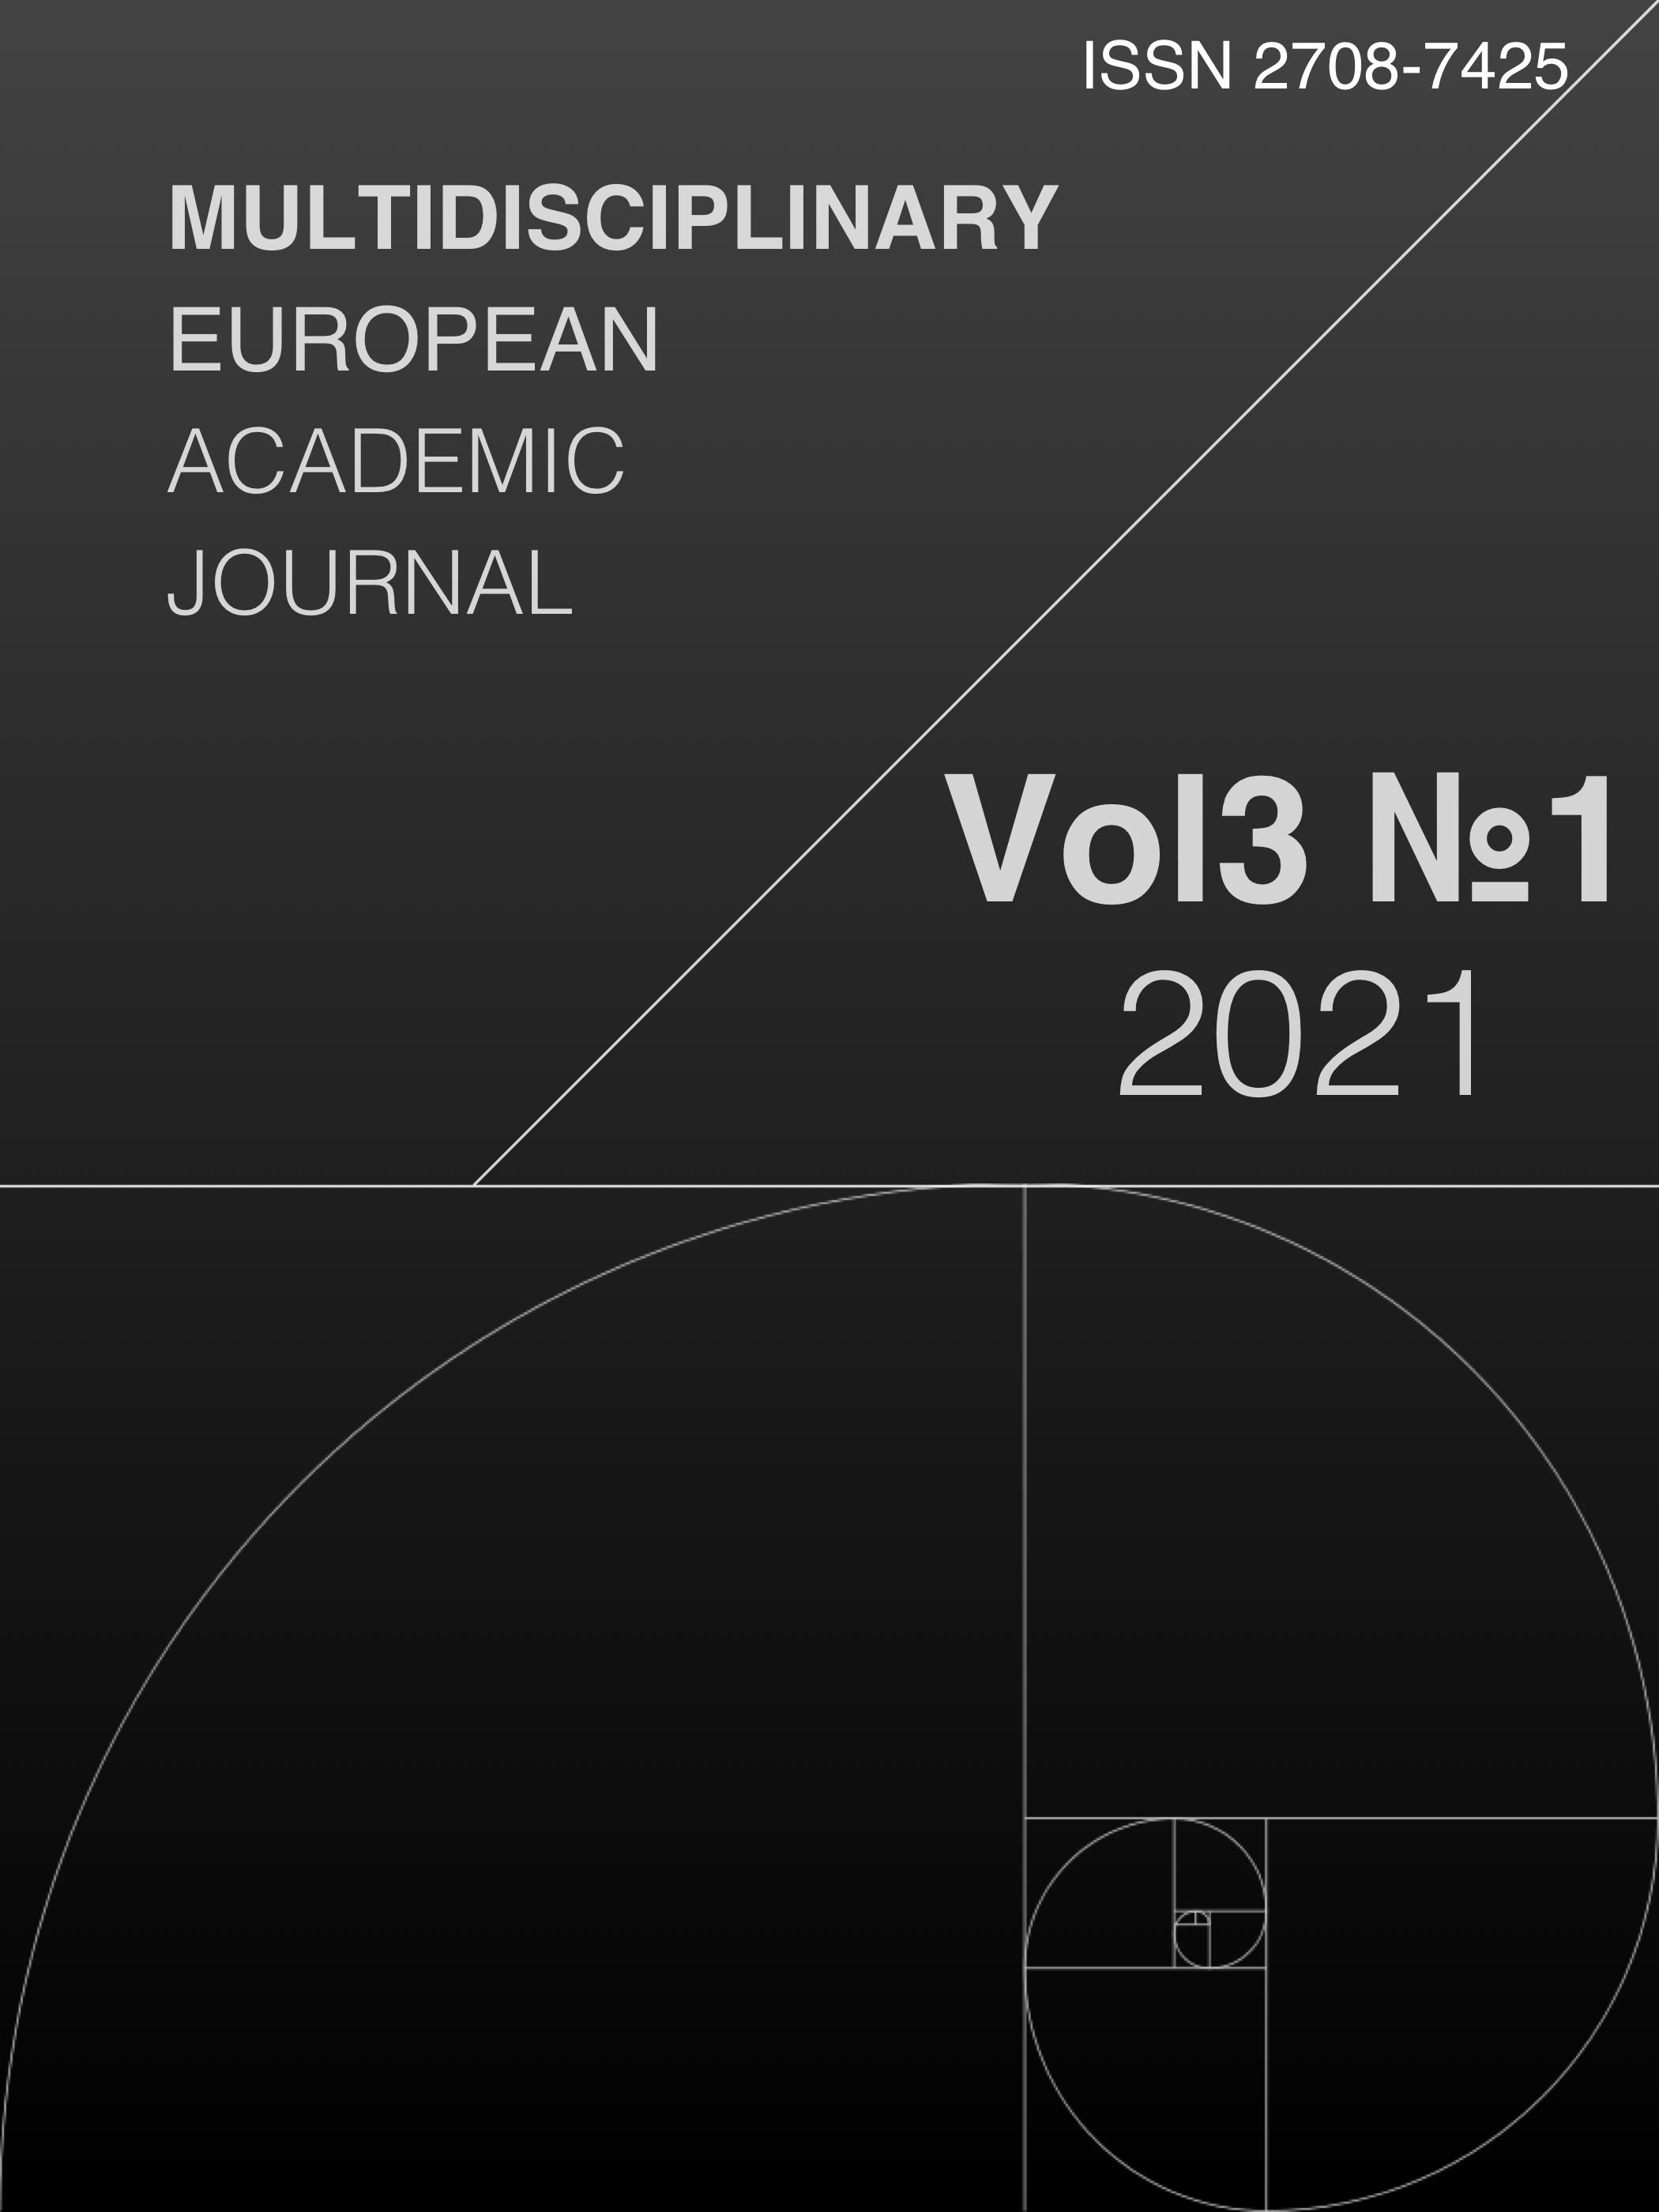 View Vol. 3 No. 1 (2021)